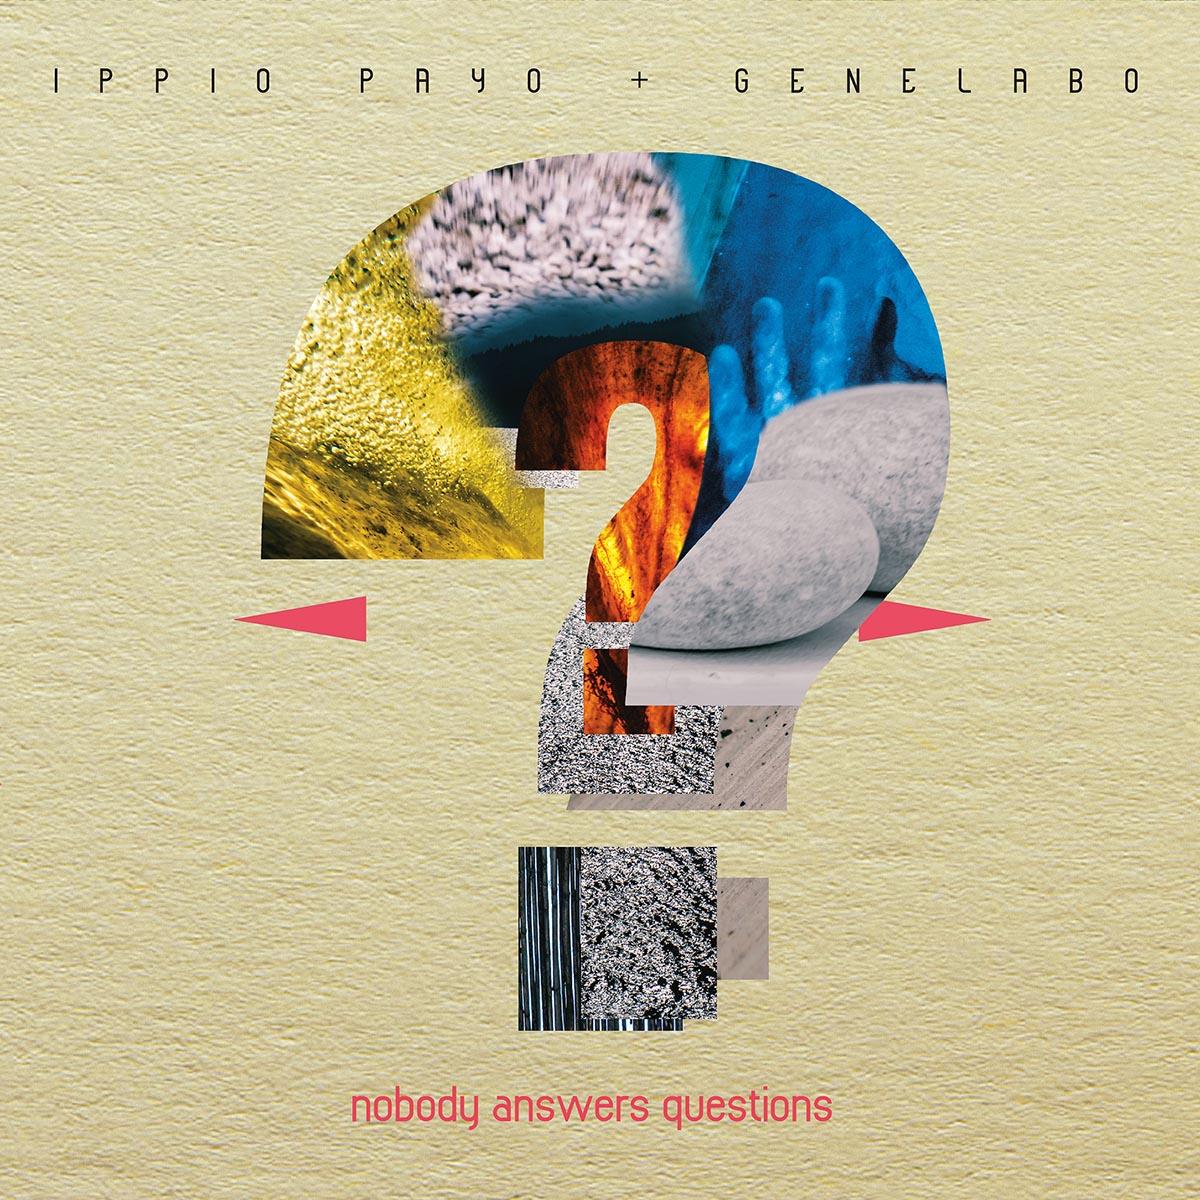 IPPIO PAYO & GENELABO - Nobody Answers Questions